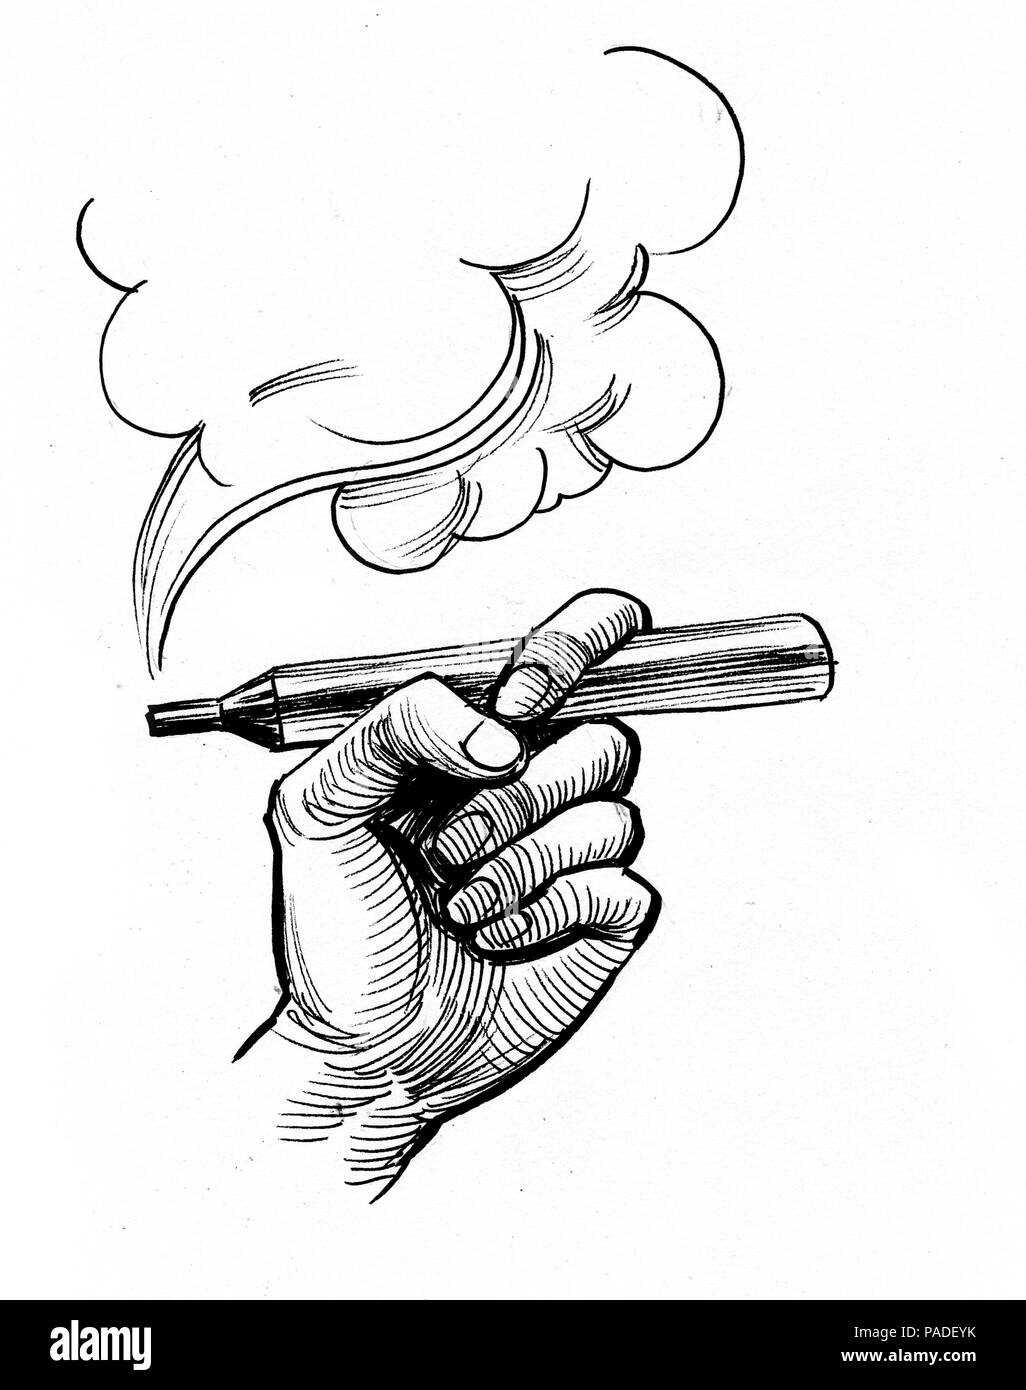 Hand holding vaporizer. Ink black and white illustration - Stock Image